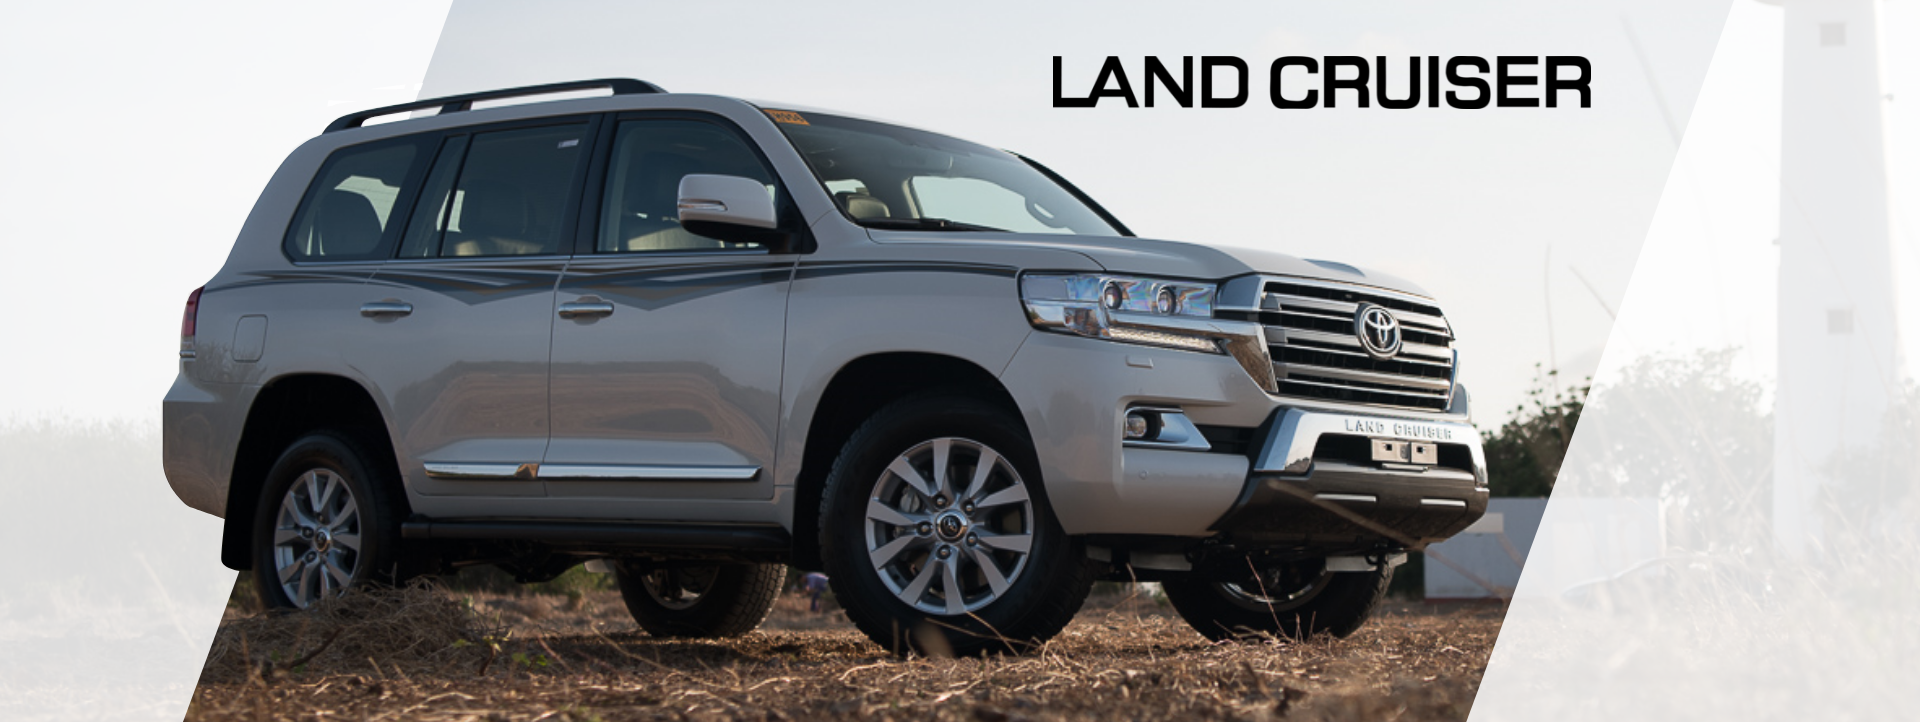 Land Cruiser Desktop Banner